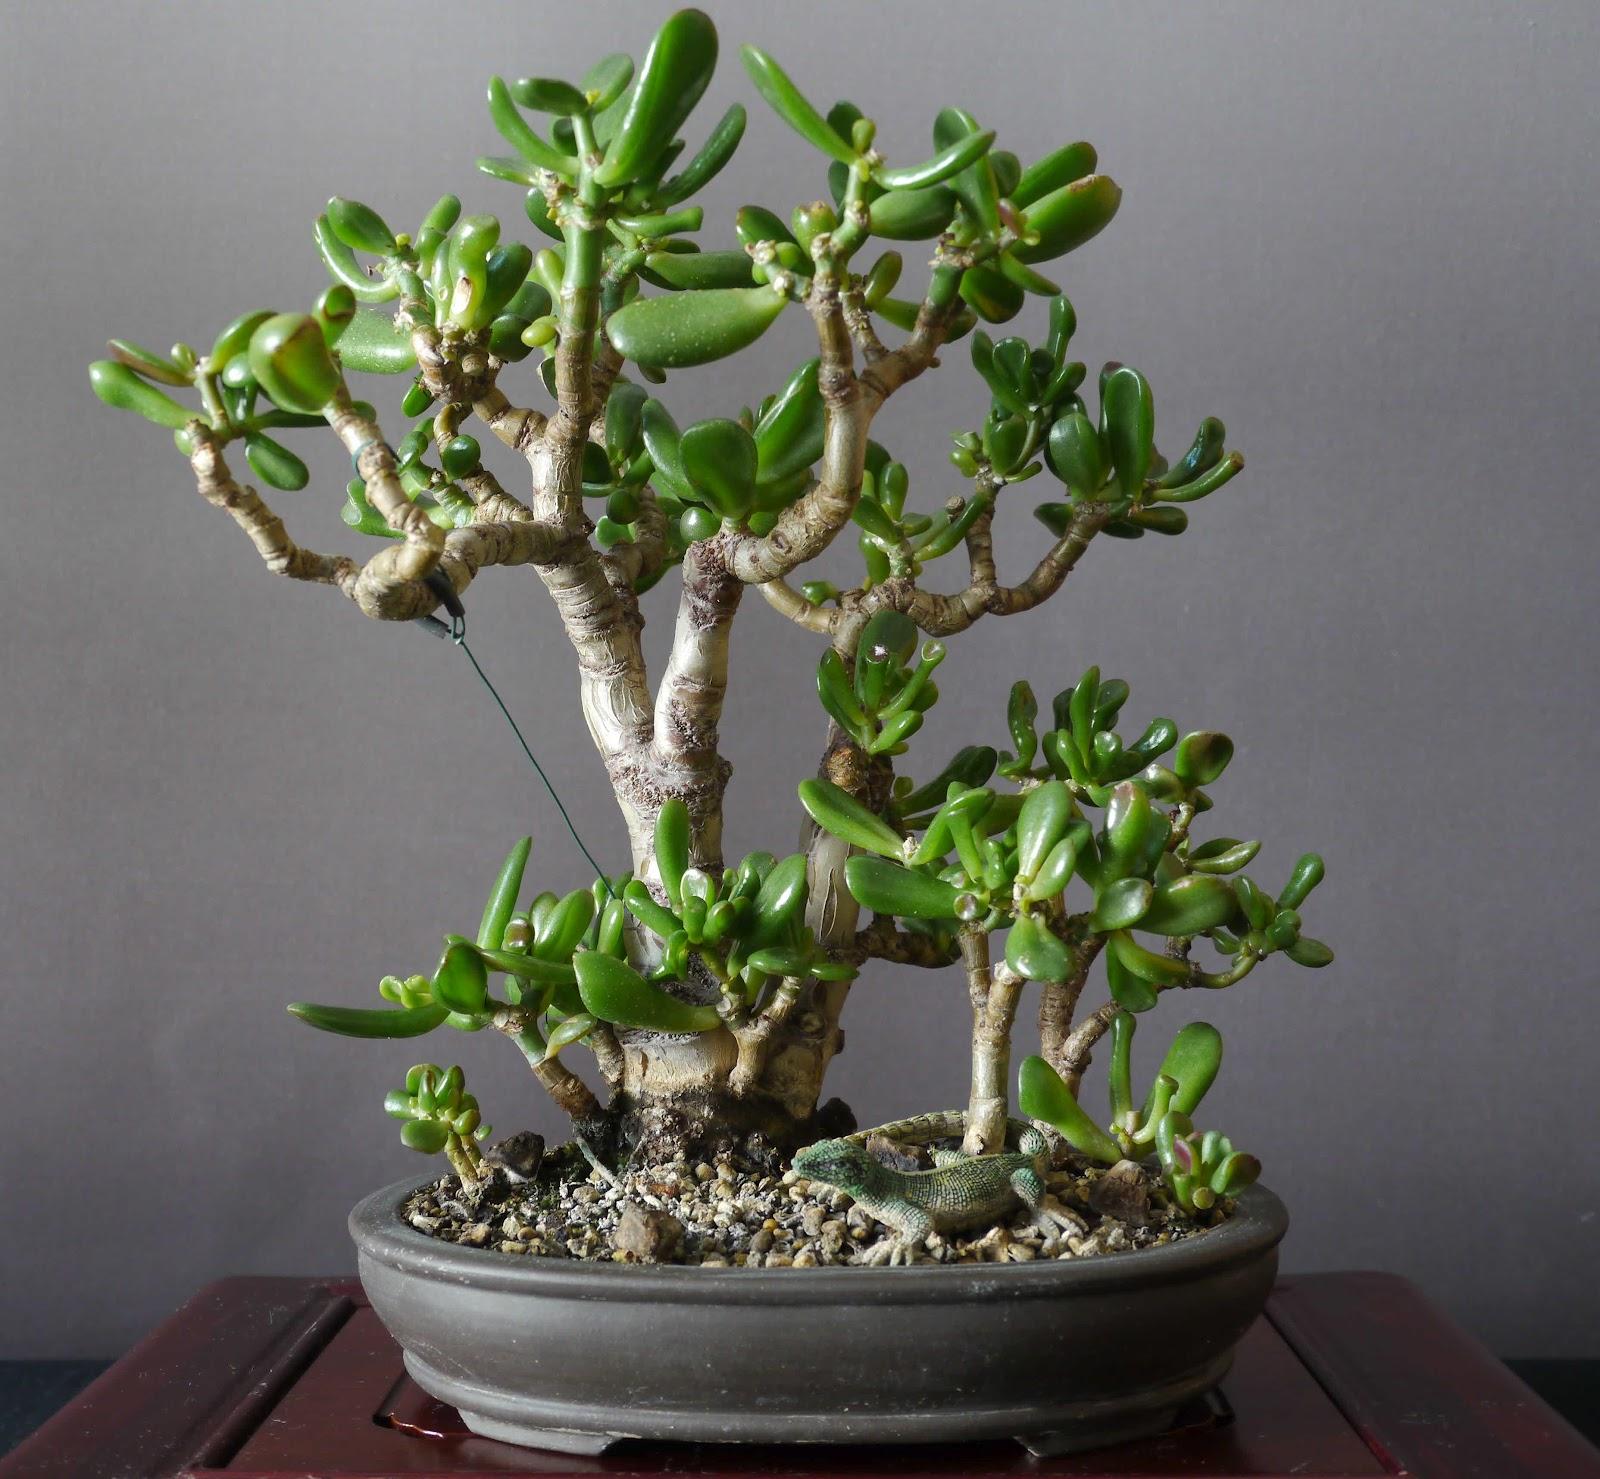 цветок денежное дерево фото разновидности